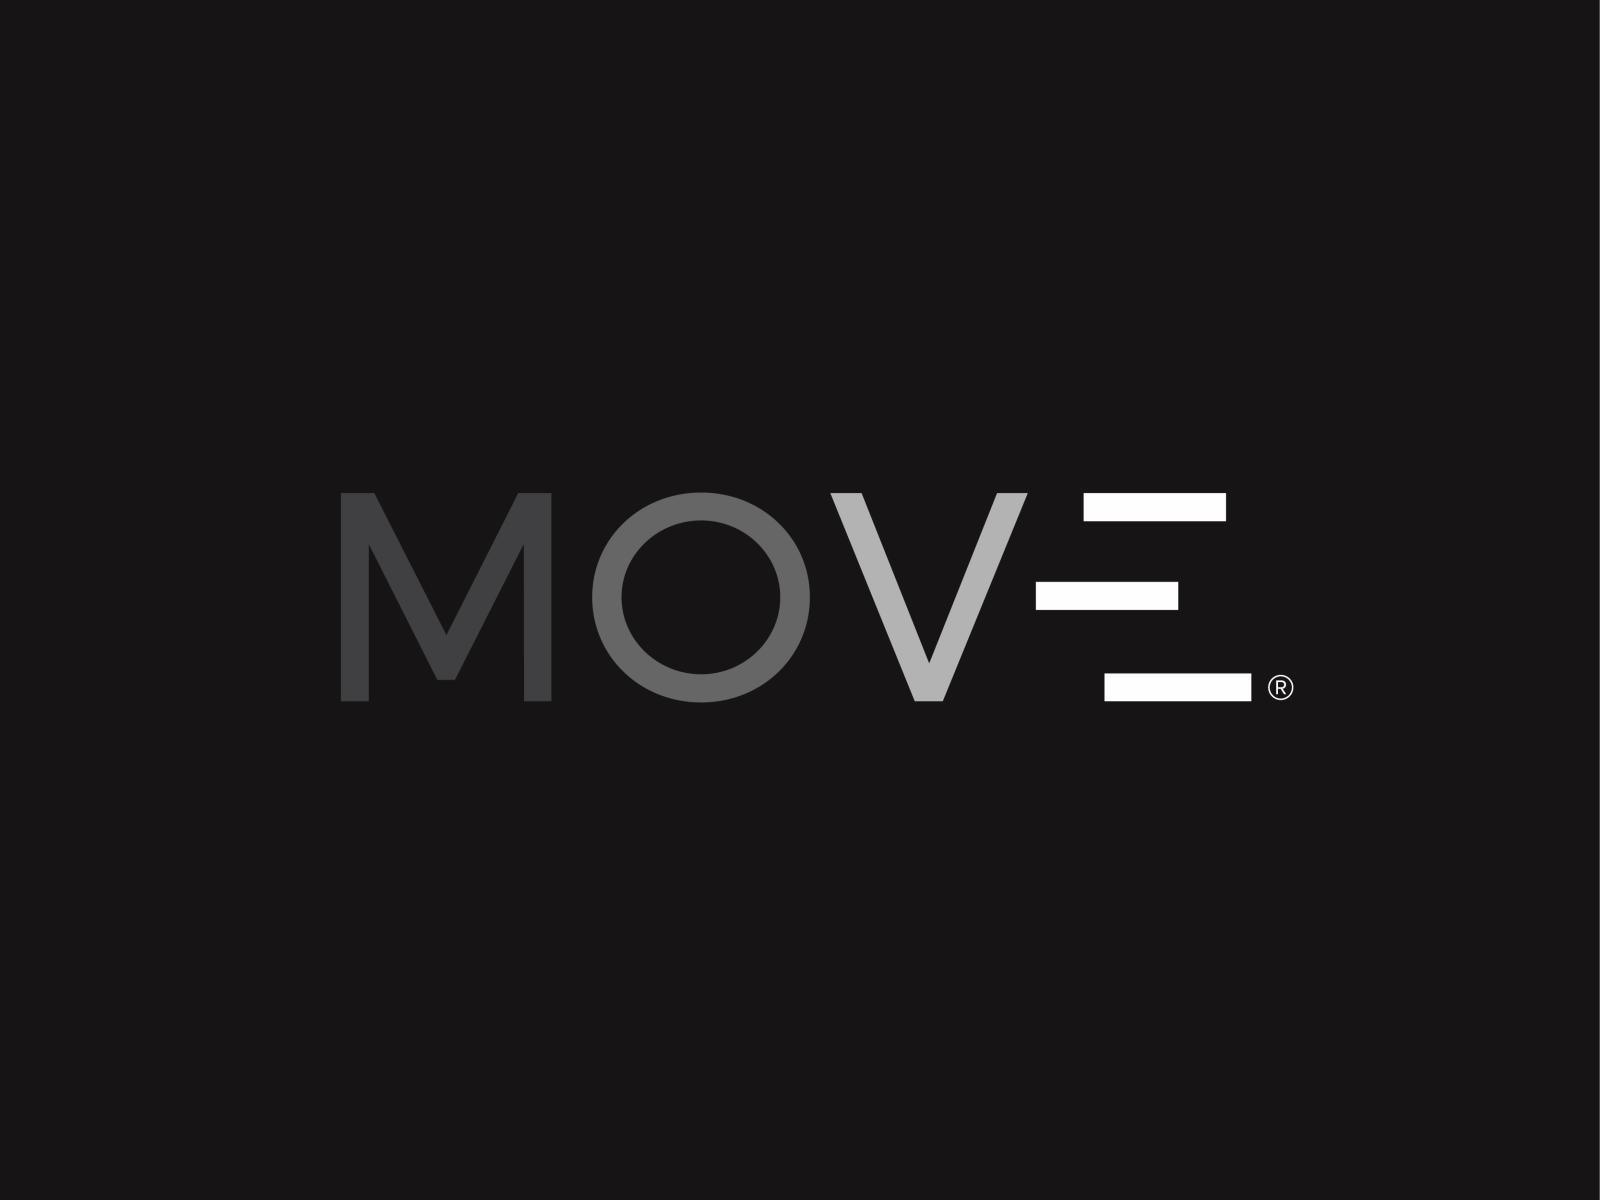 Move Logo Design By Ashraful Islam On Dribbble